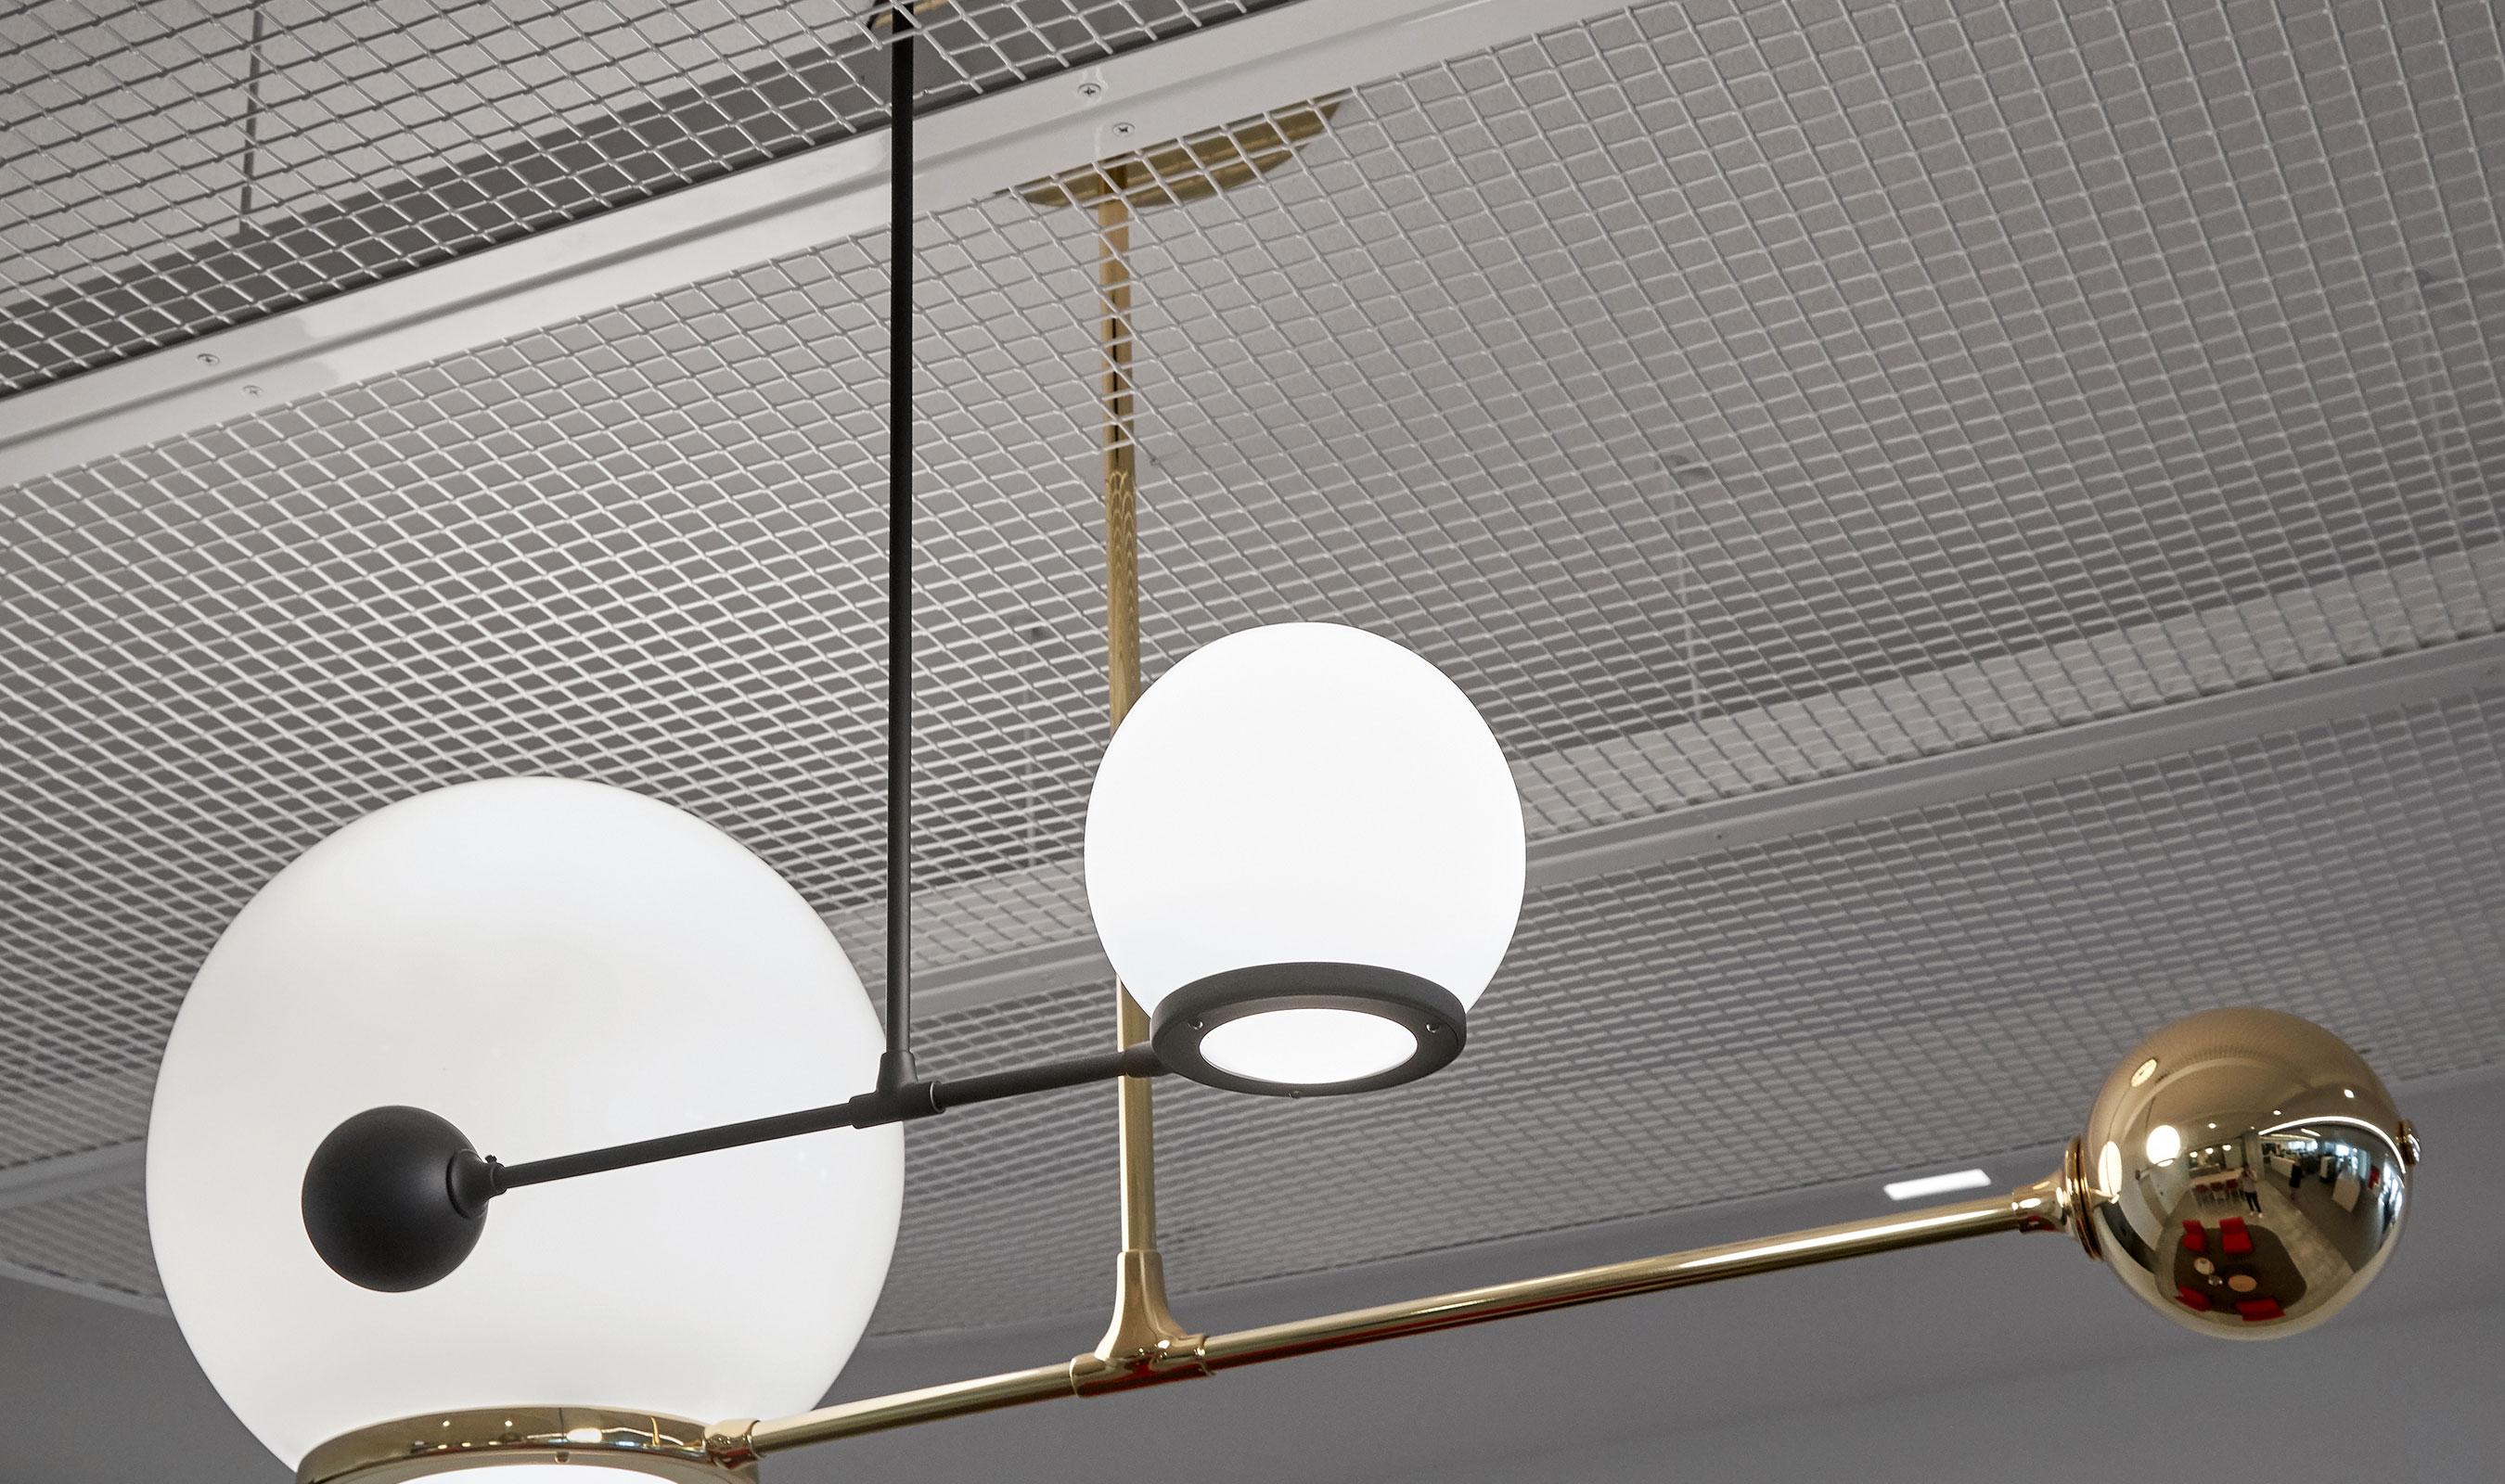 Decorative ceiling elements using L-81 provide textural interest against metallic pendant lights.